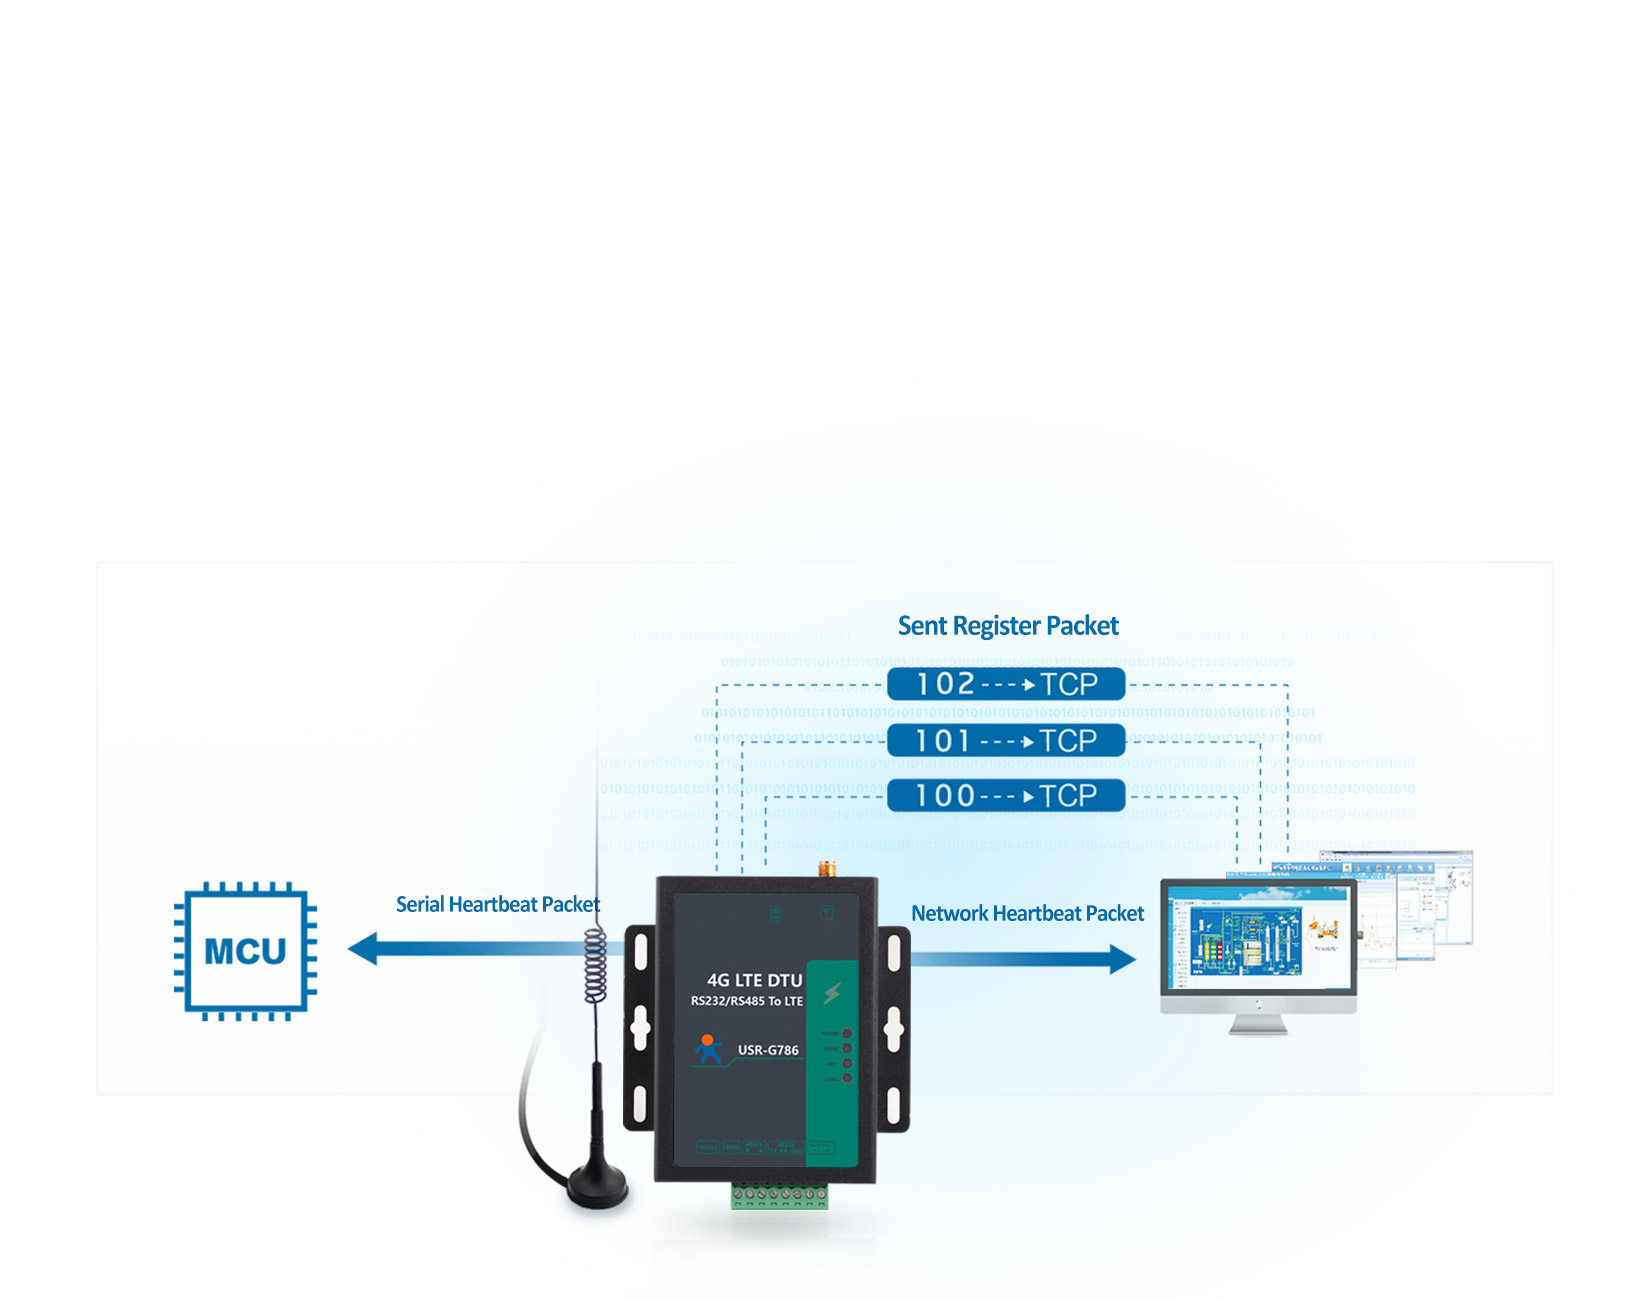 Cellular 4G LTE Modem USR-G786-E: Register Package+ Heartbeat Package